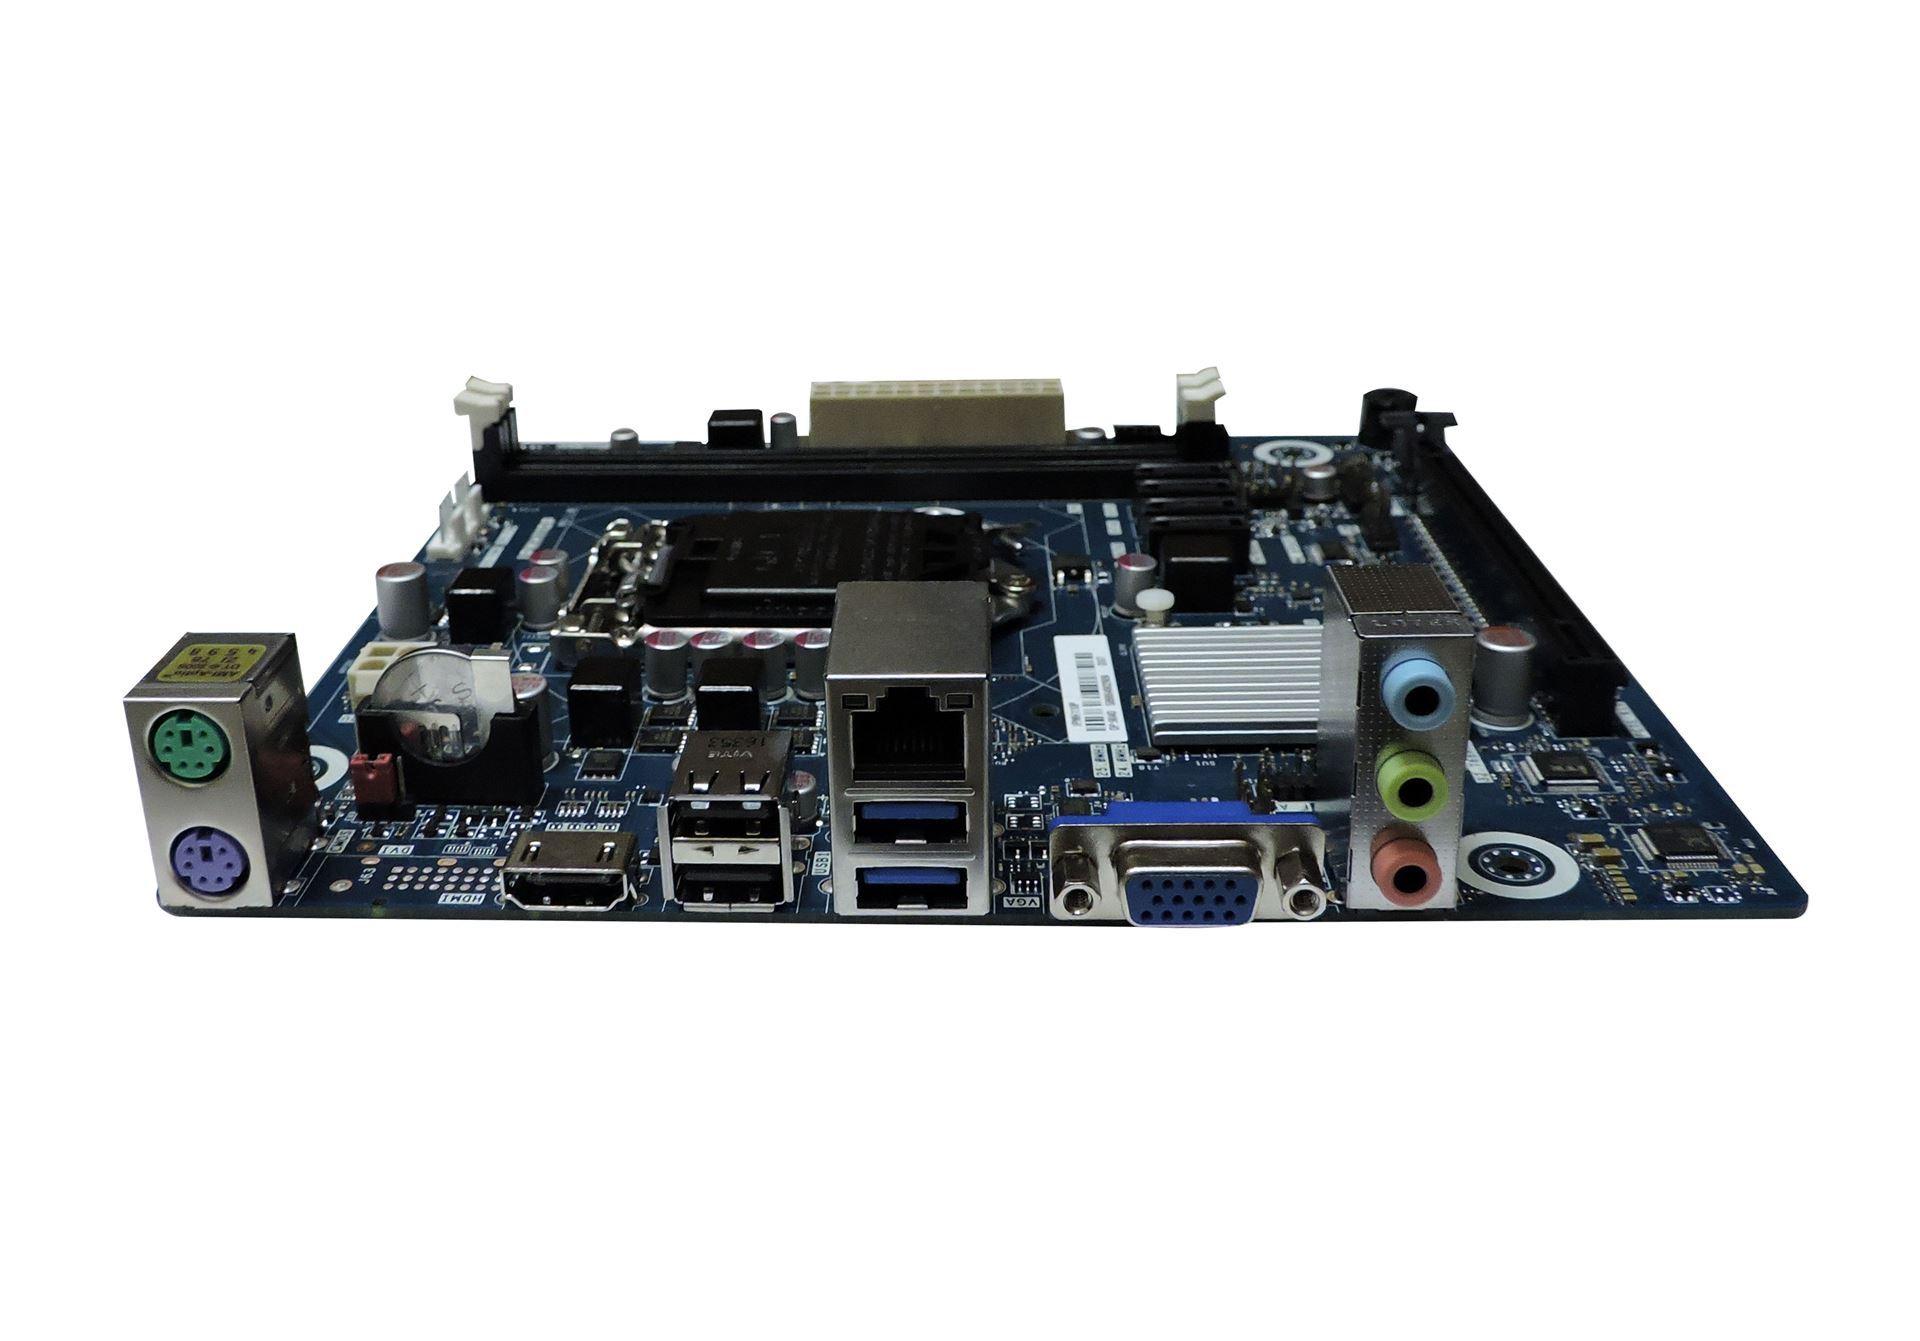 Placa Mae PC-WARE - IPMH110P